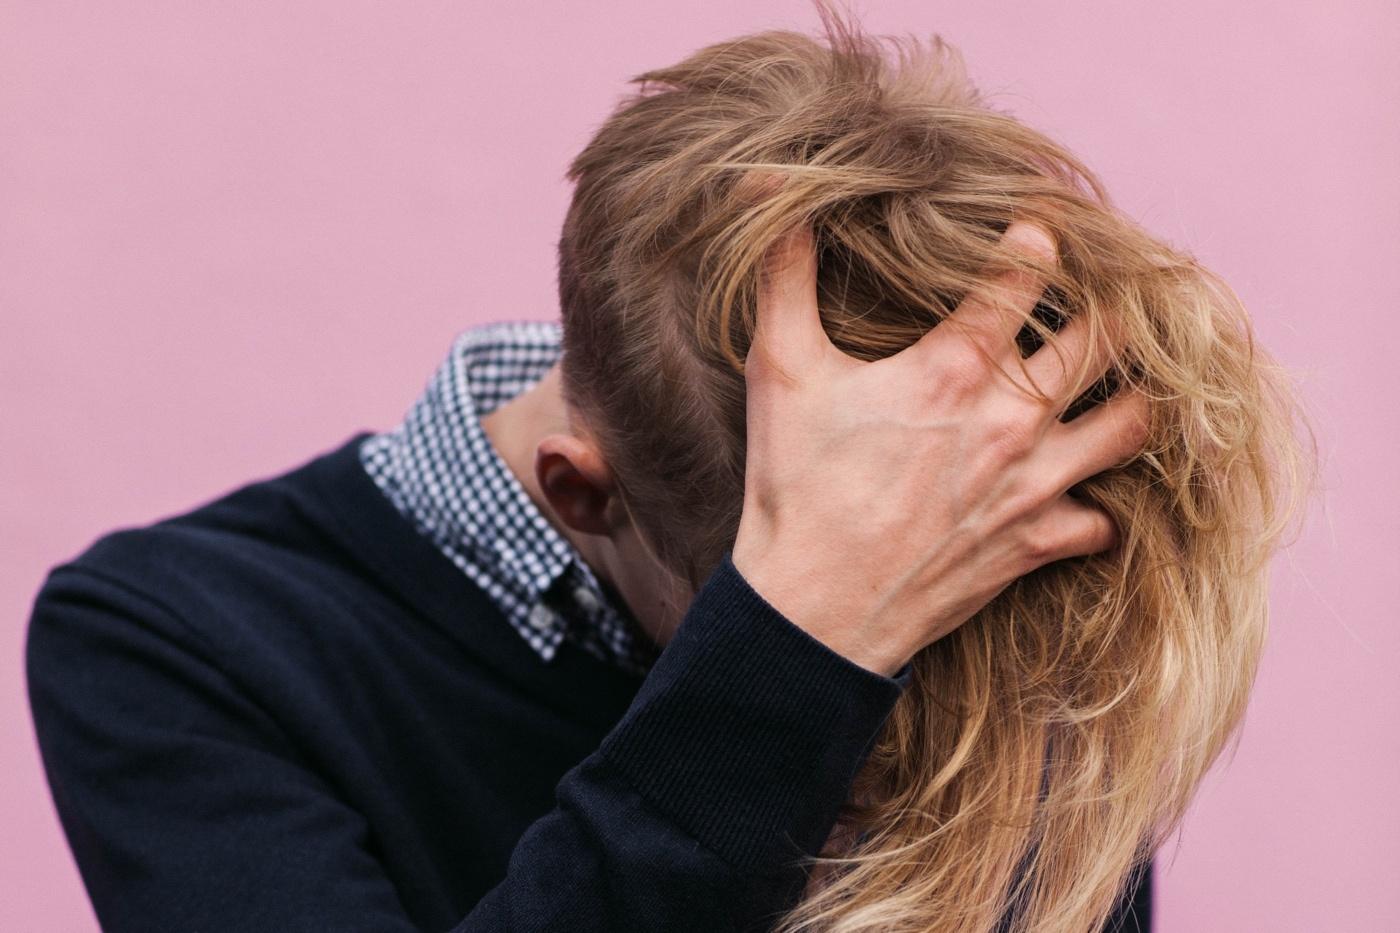 trauma-lupuscorner-ptsd-cover-post-traumatic-stress-disorder